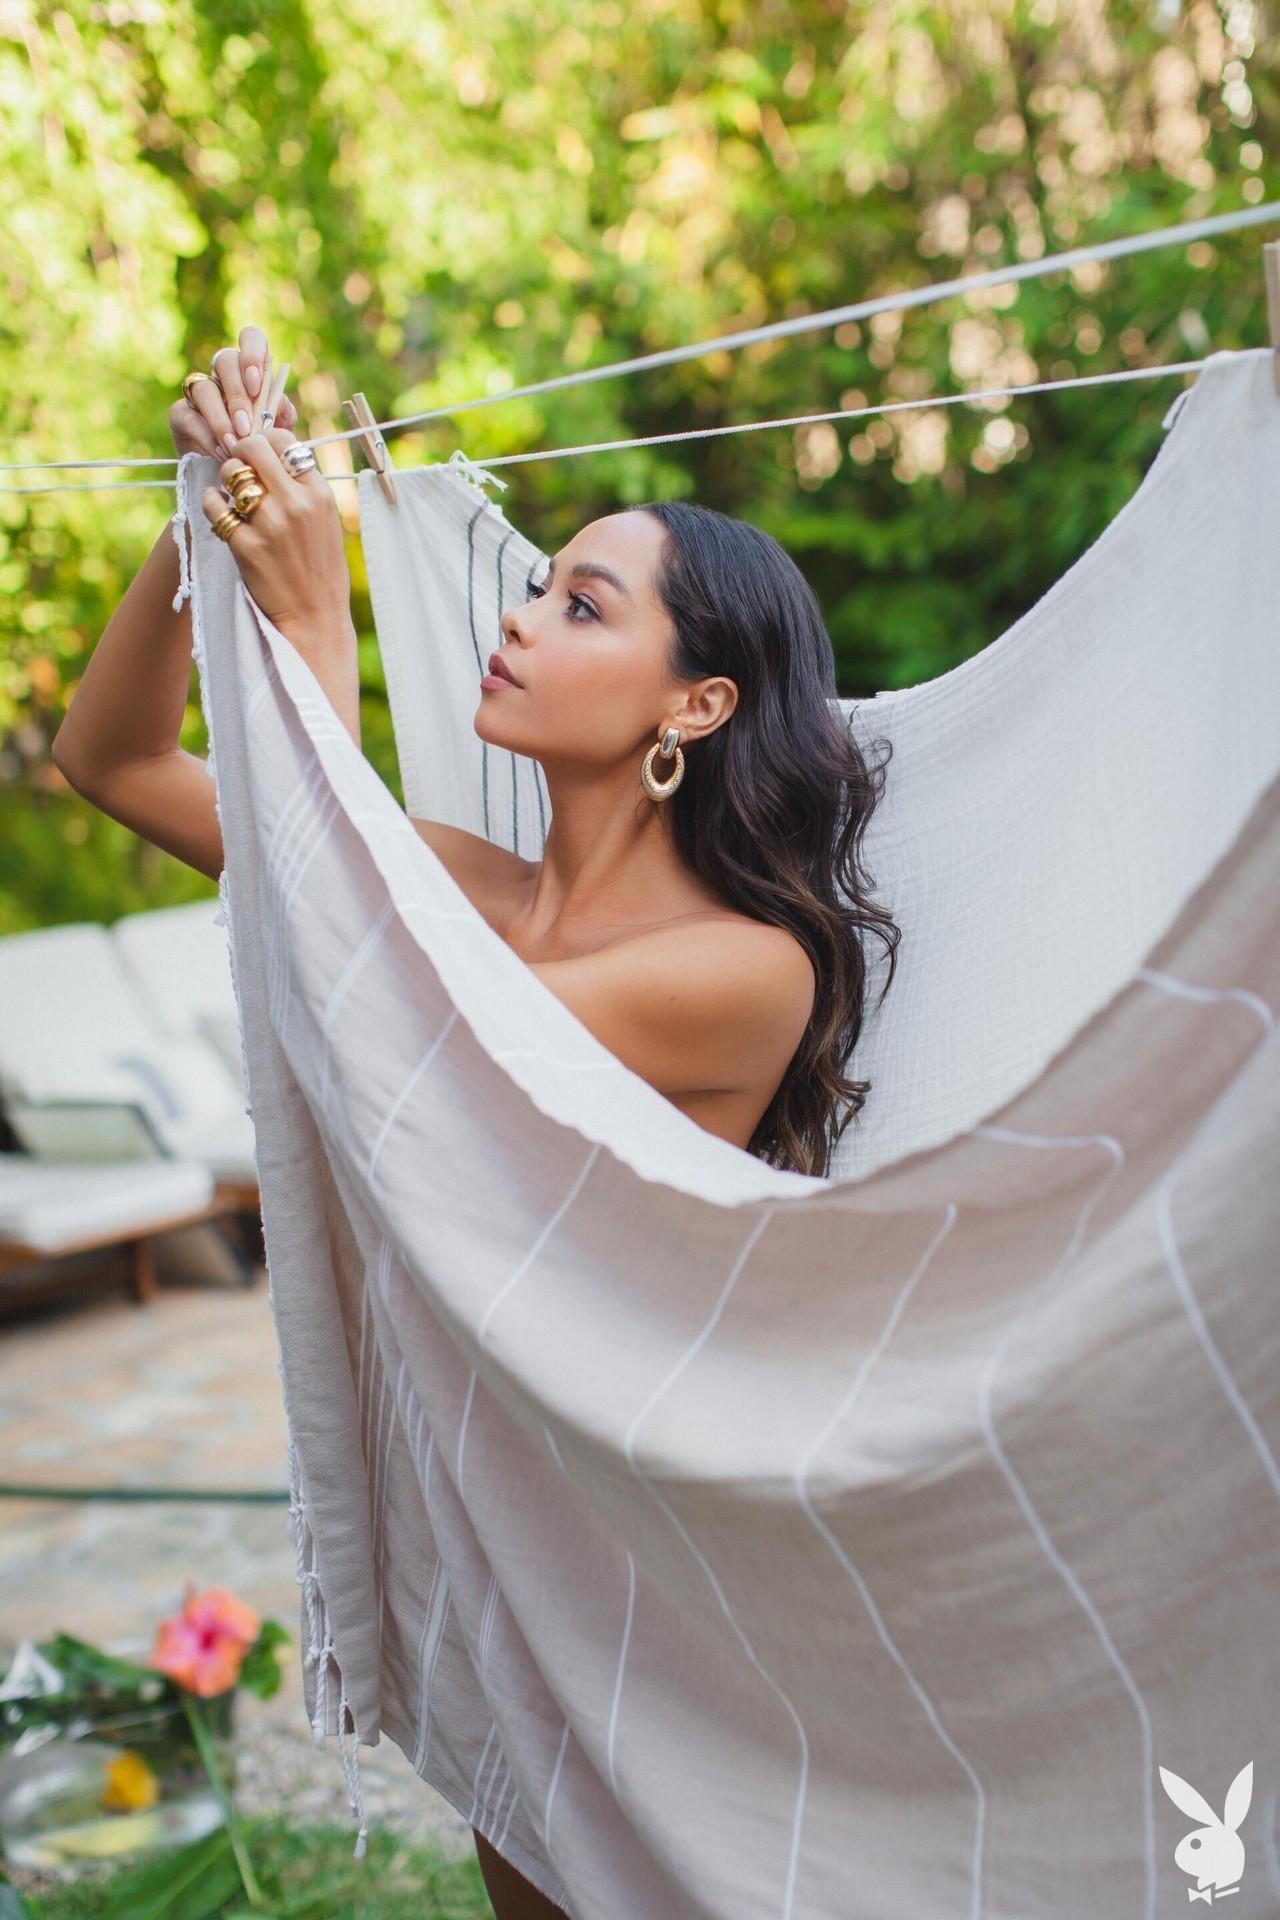 Danielle Alcaraz Playmate Outtakes Playboy Plus (15)